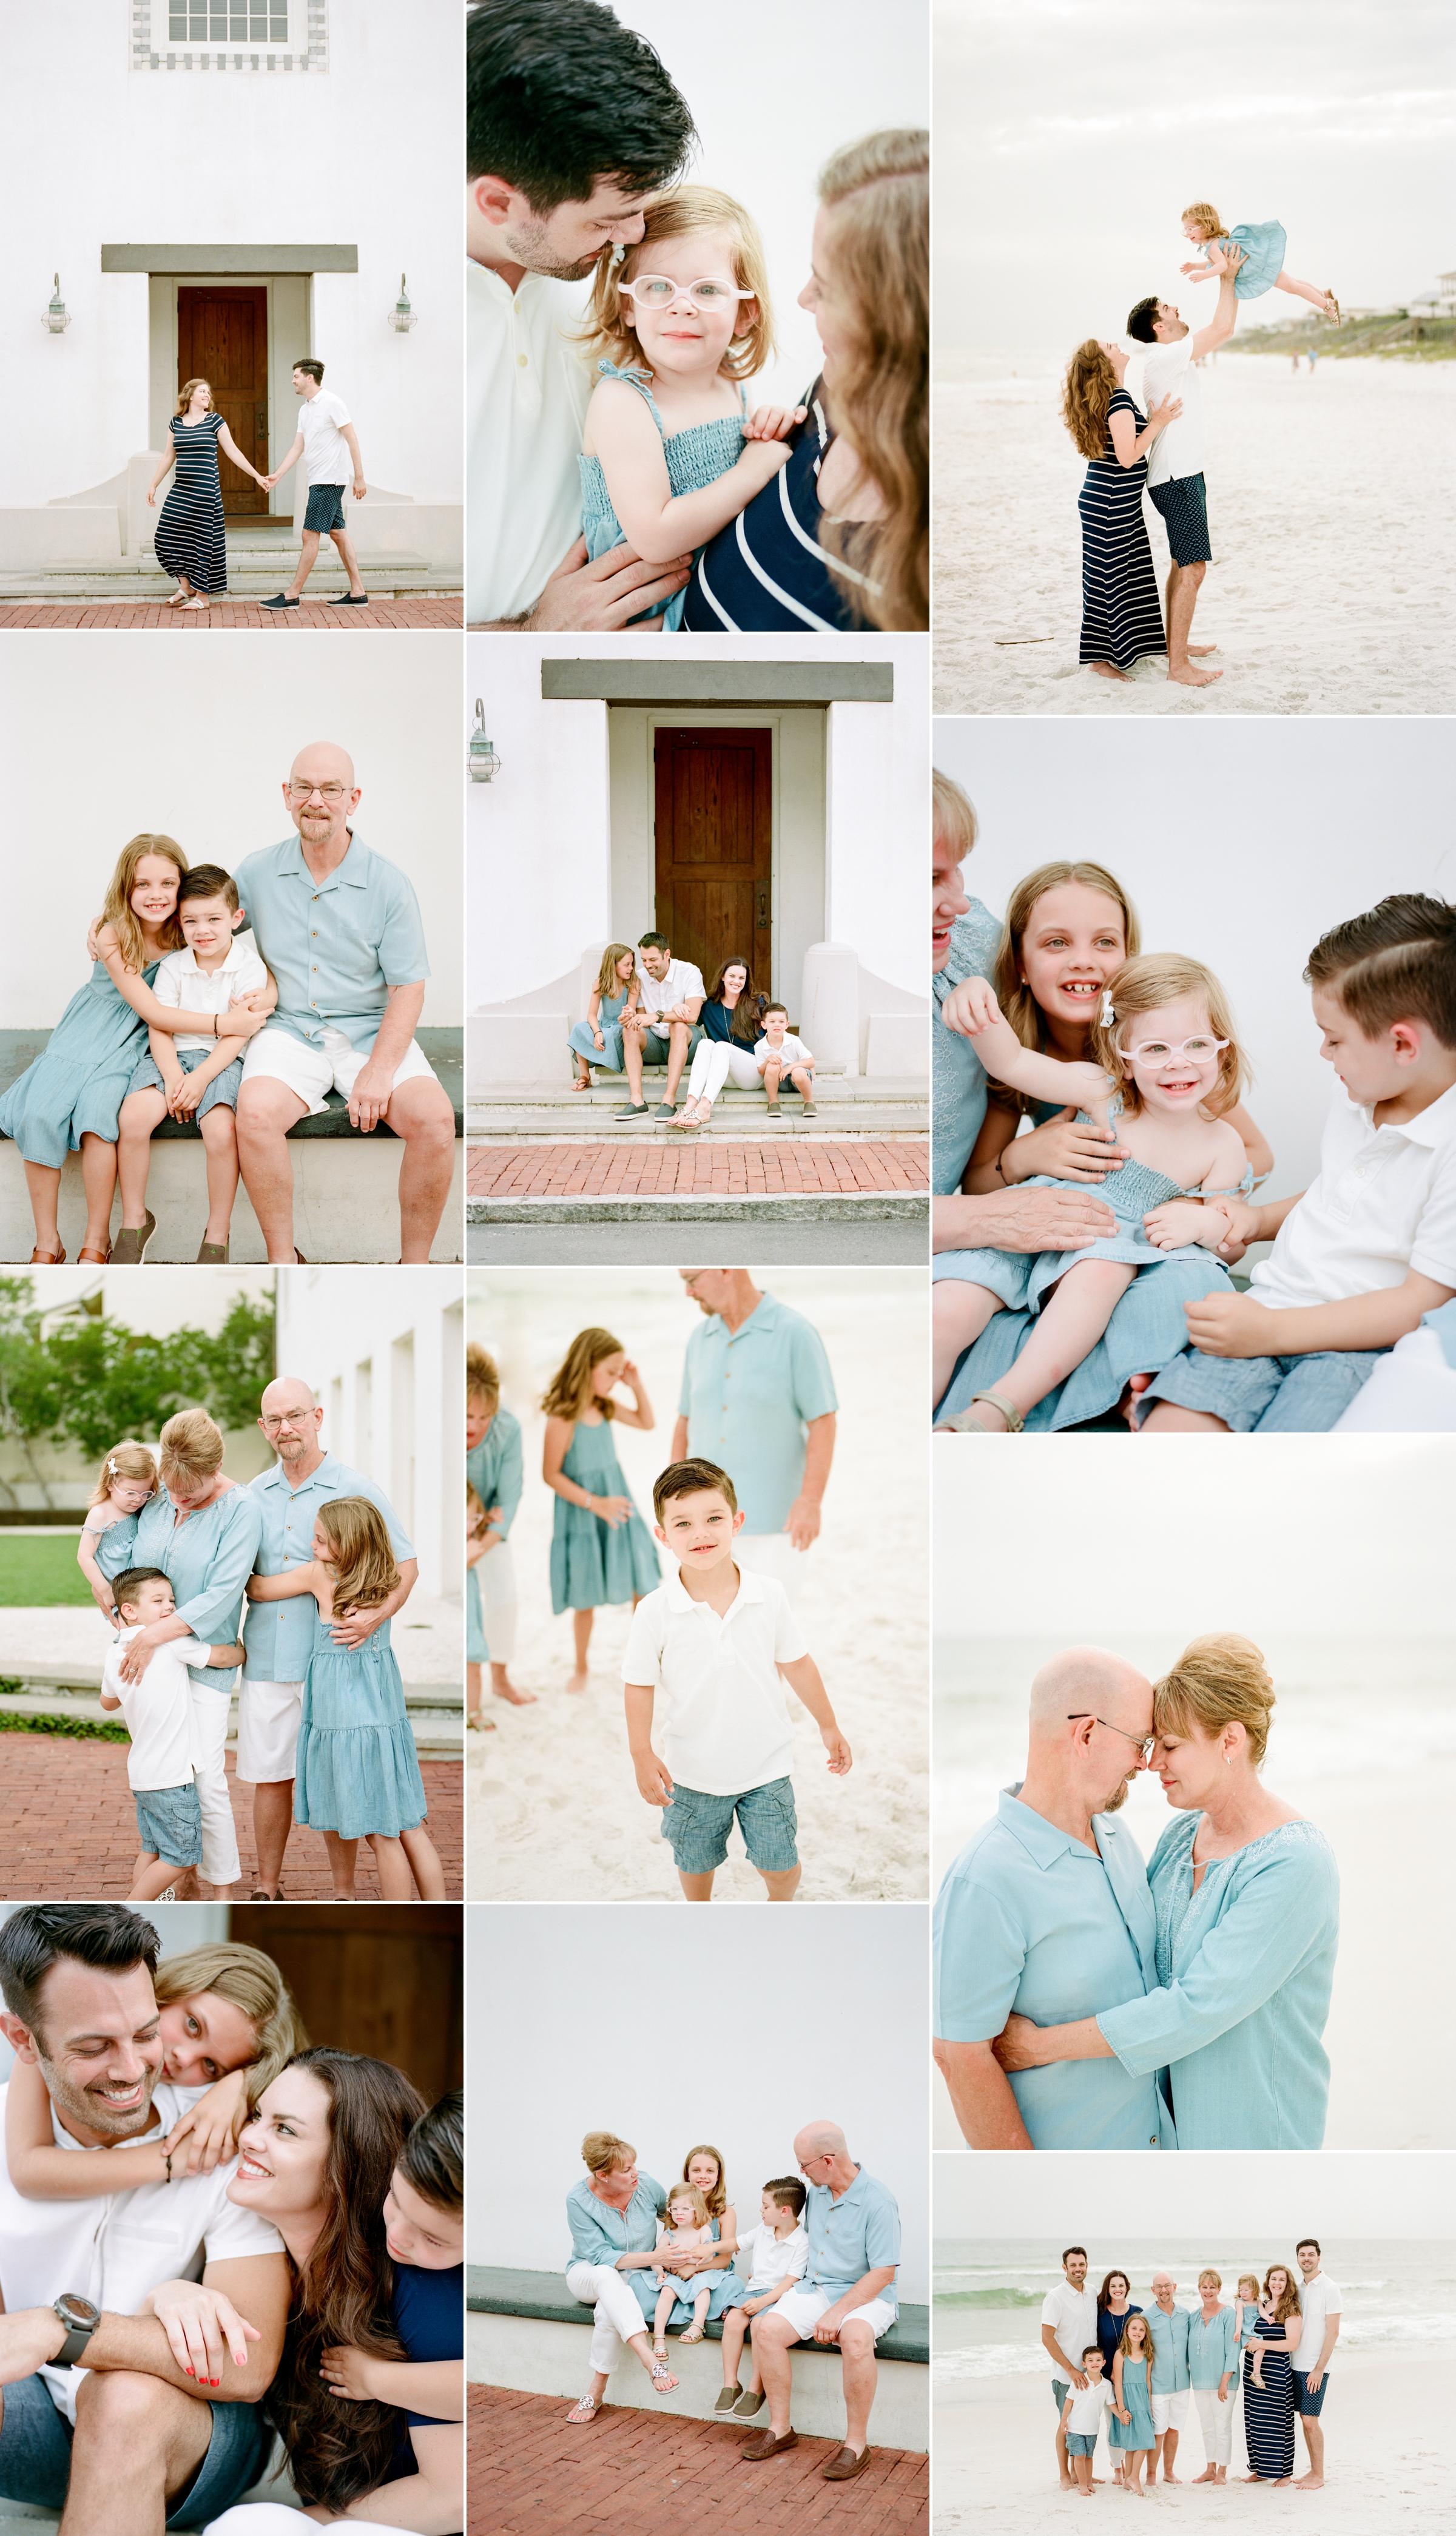 rosemary_beach_family_photographer_0002.jpg